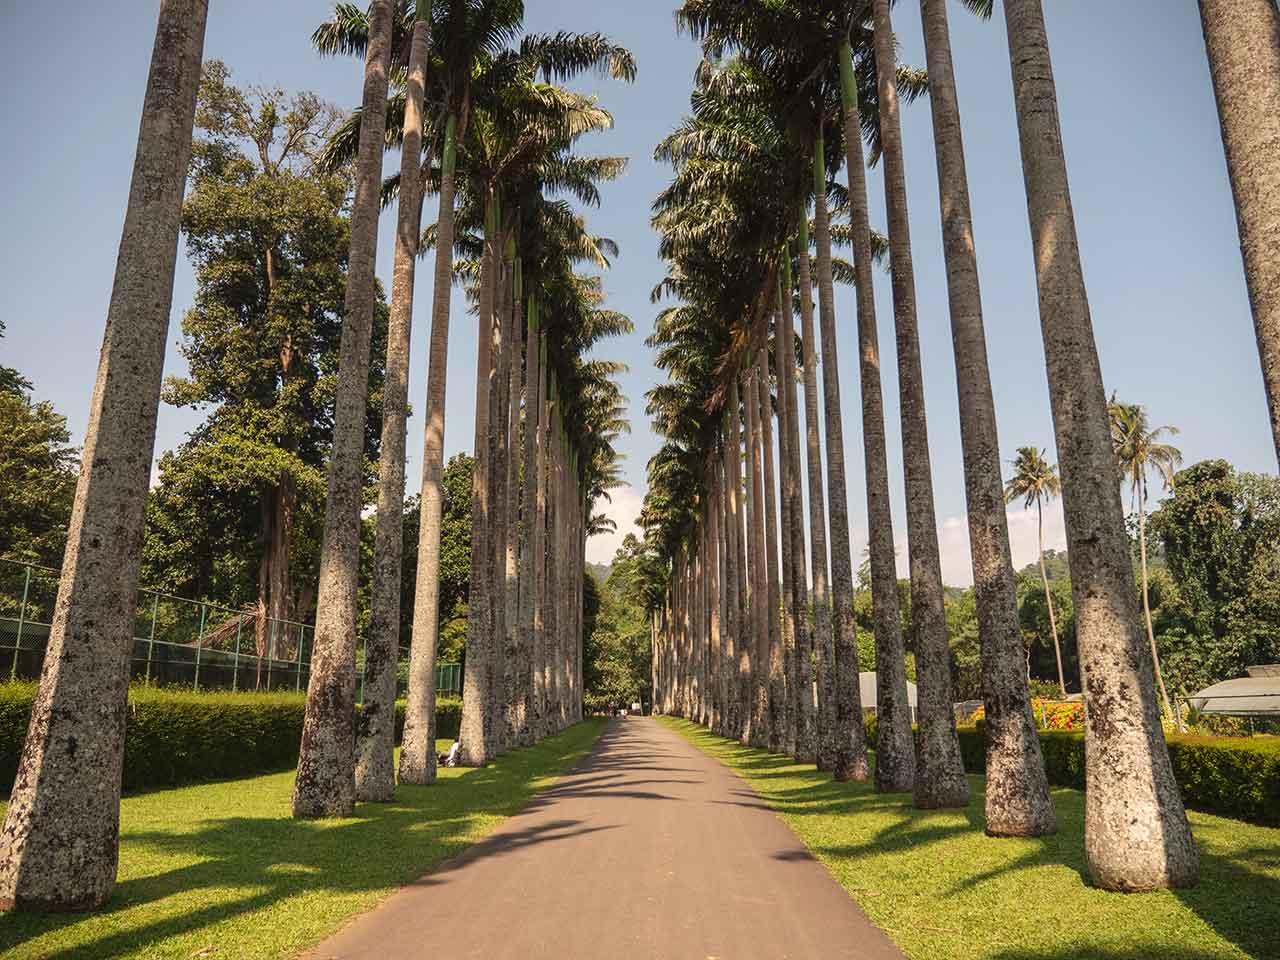 Palmenallee im Botanical Garden in Kandy, Sri Lanka